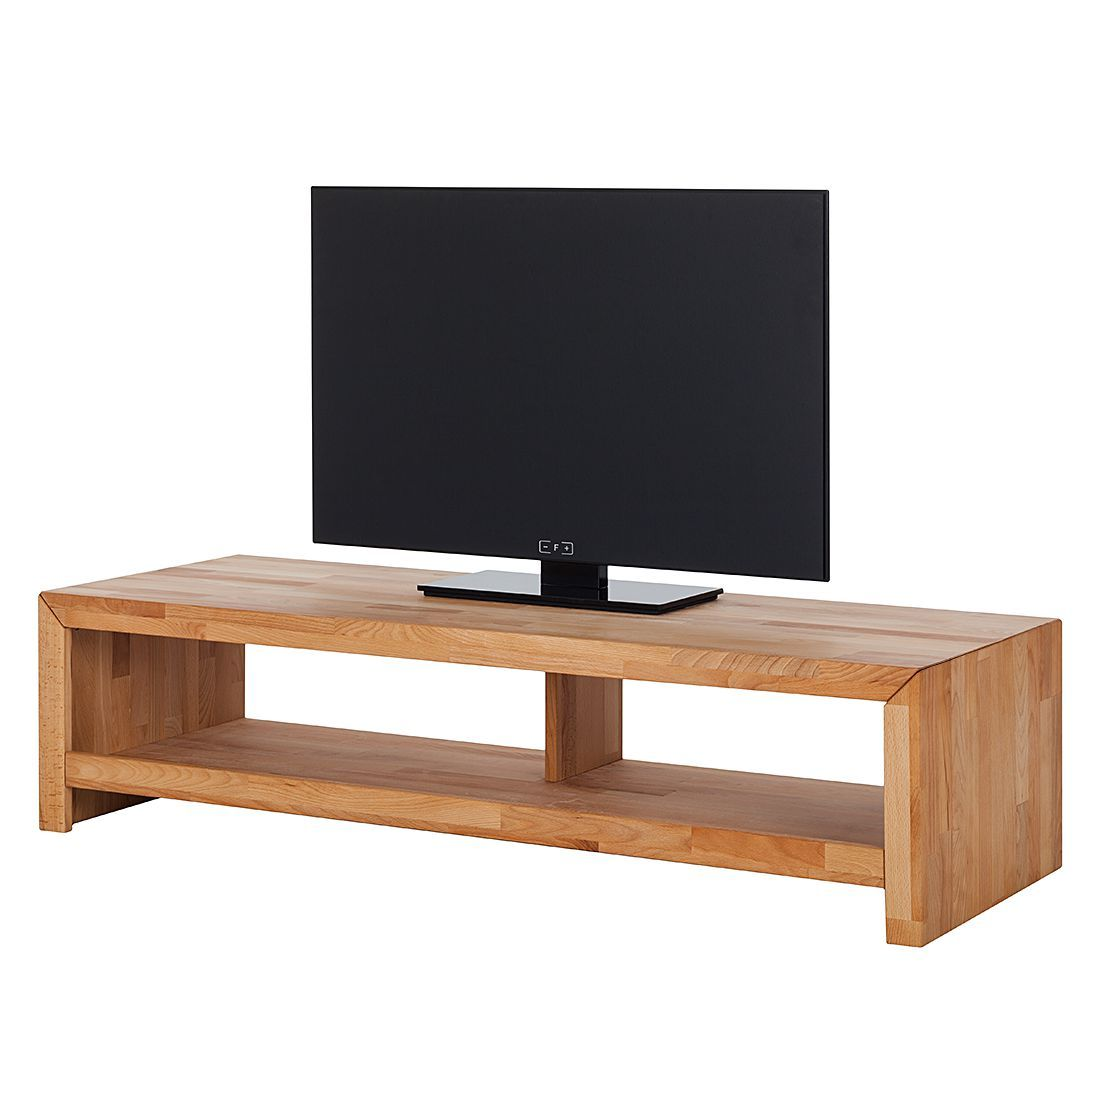 Pin By Ladendirekt On Schranke Cabinet Furniture Furniture Sideboard